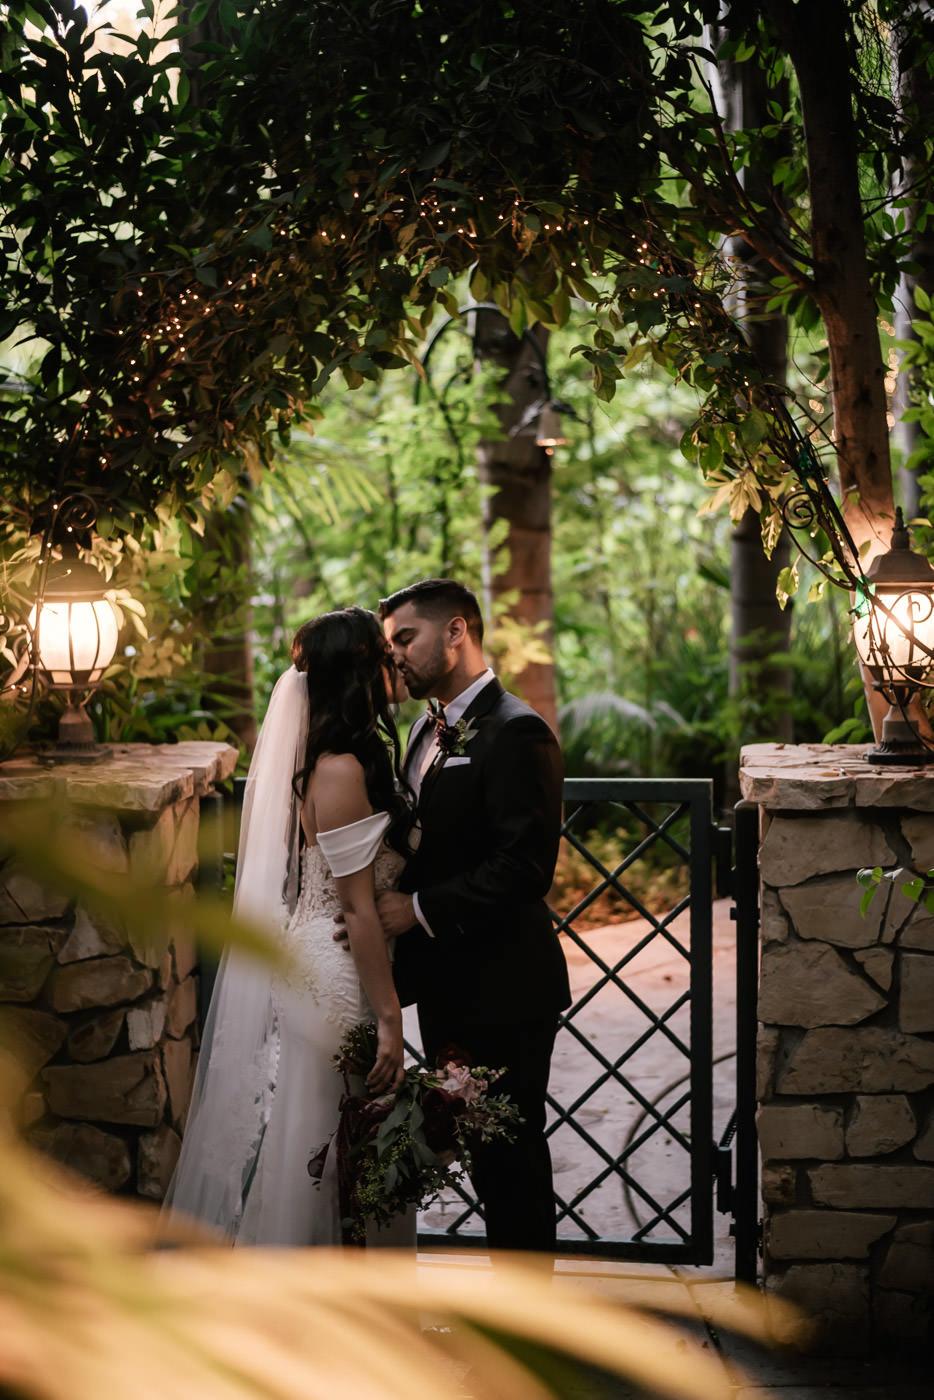 eden-gardens-wedding-photographer-romantic-84.jpg